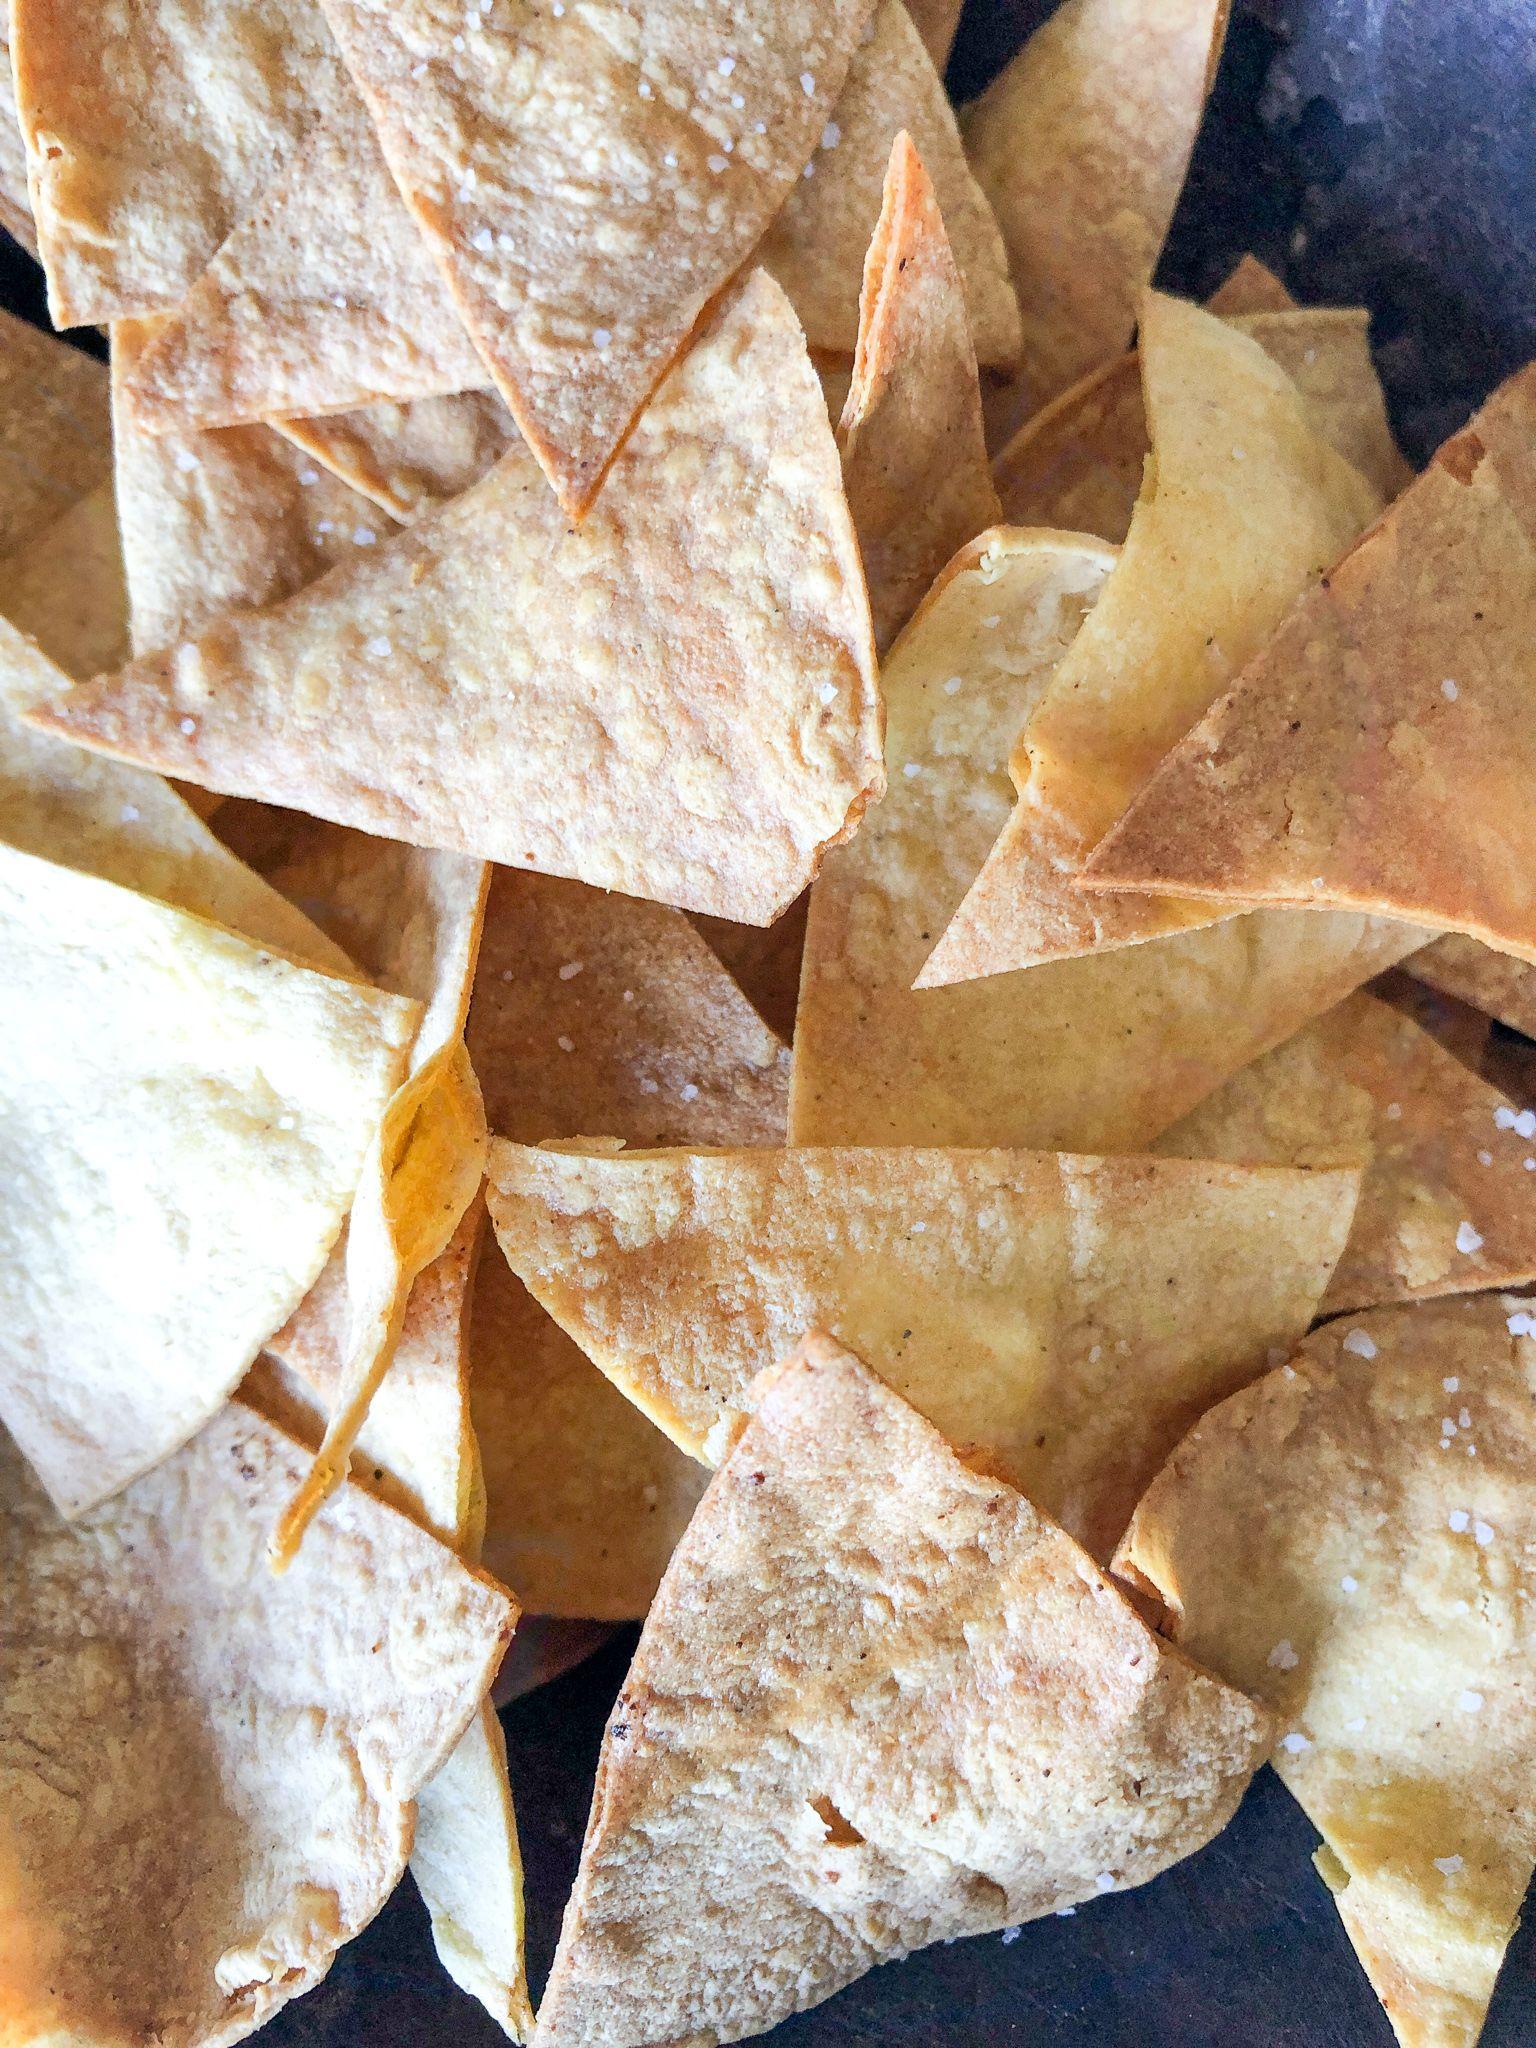 Air fryer tortilla chips mission yellow corn tortillas